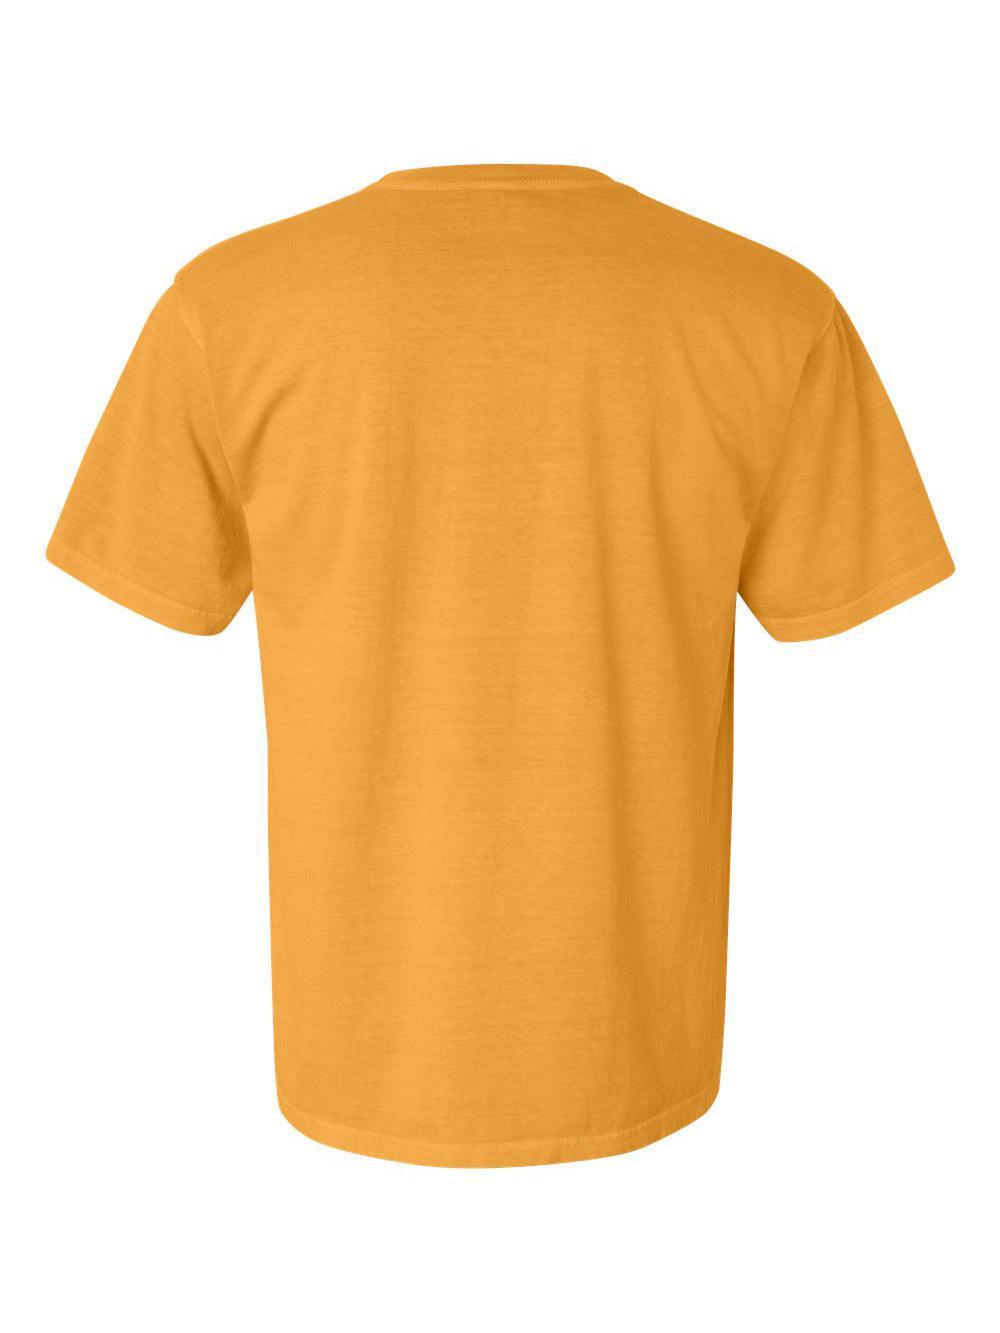 Comfort-Colors-Garment-Dyed-Heavyweight-Ringspun-Short-Sleeve-Shirt-1717 thumbnail 40